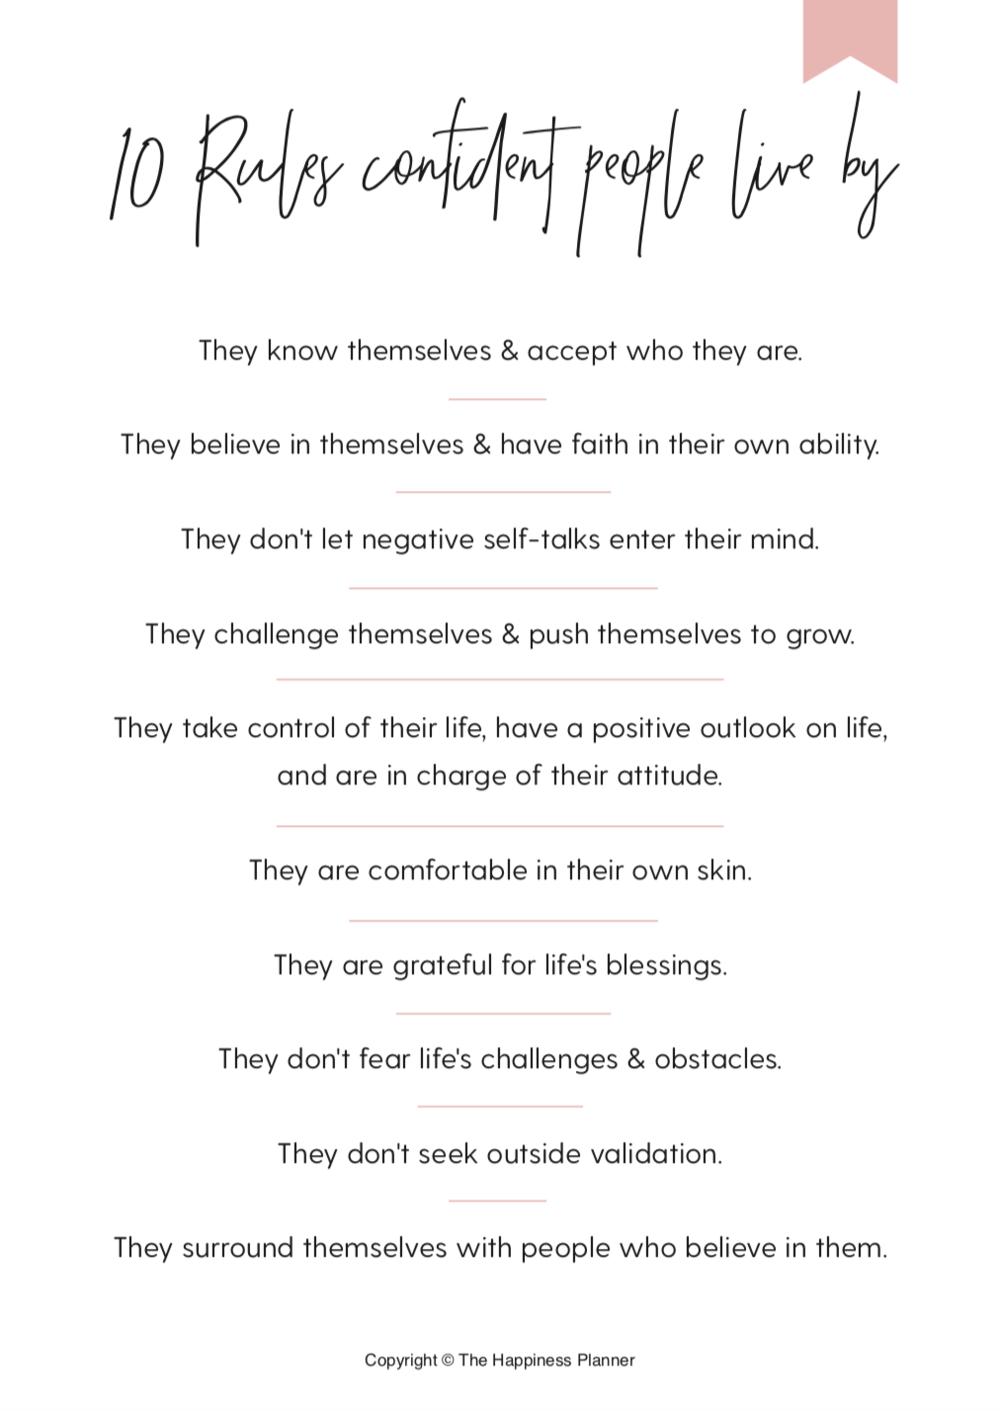 Printables Confidence Self Esteem Worksheets Self Esteem Negative Self Talk [ 1411 x 1000 Pixel ]